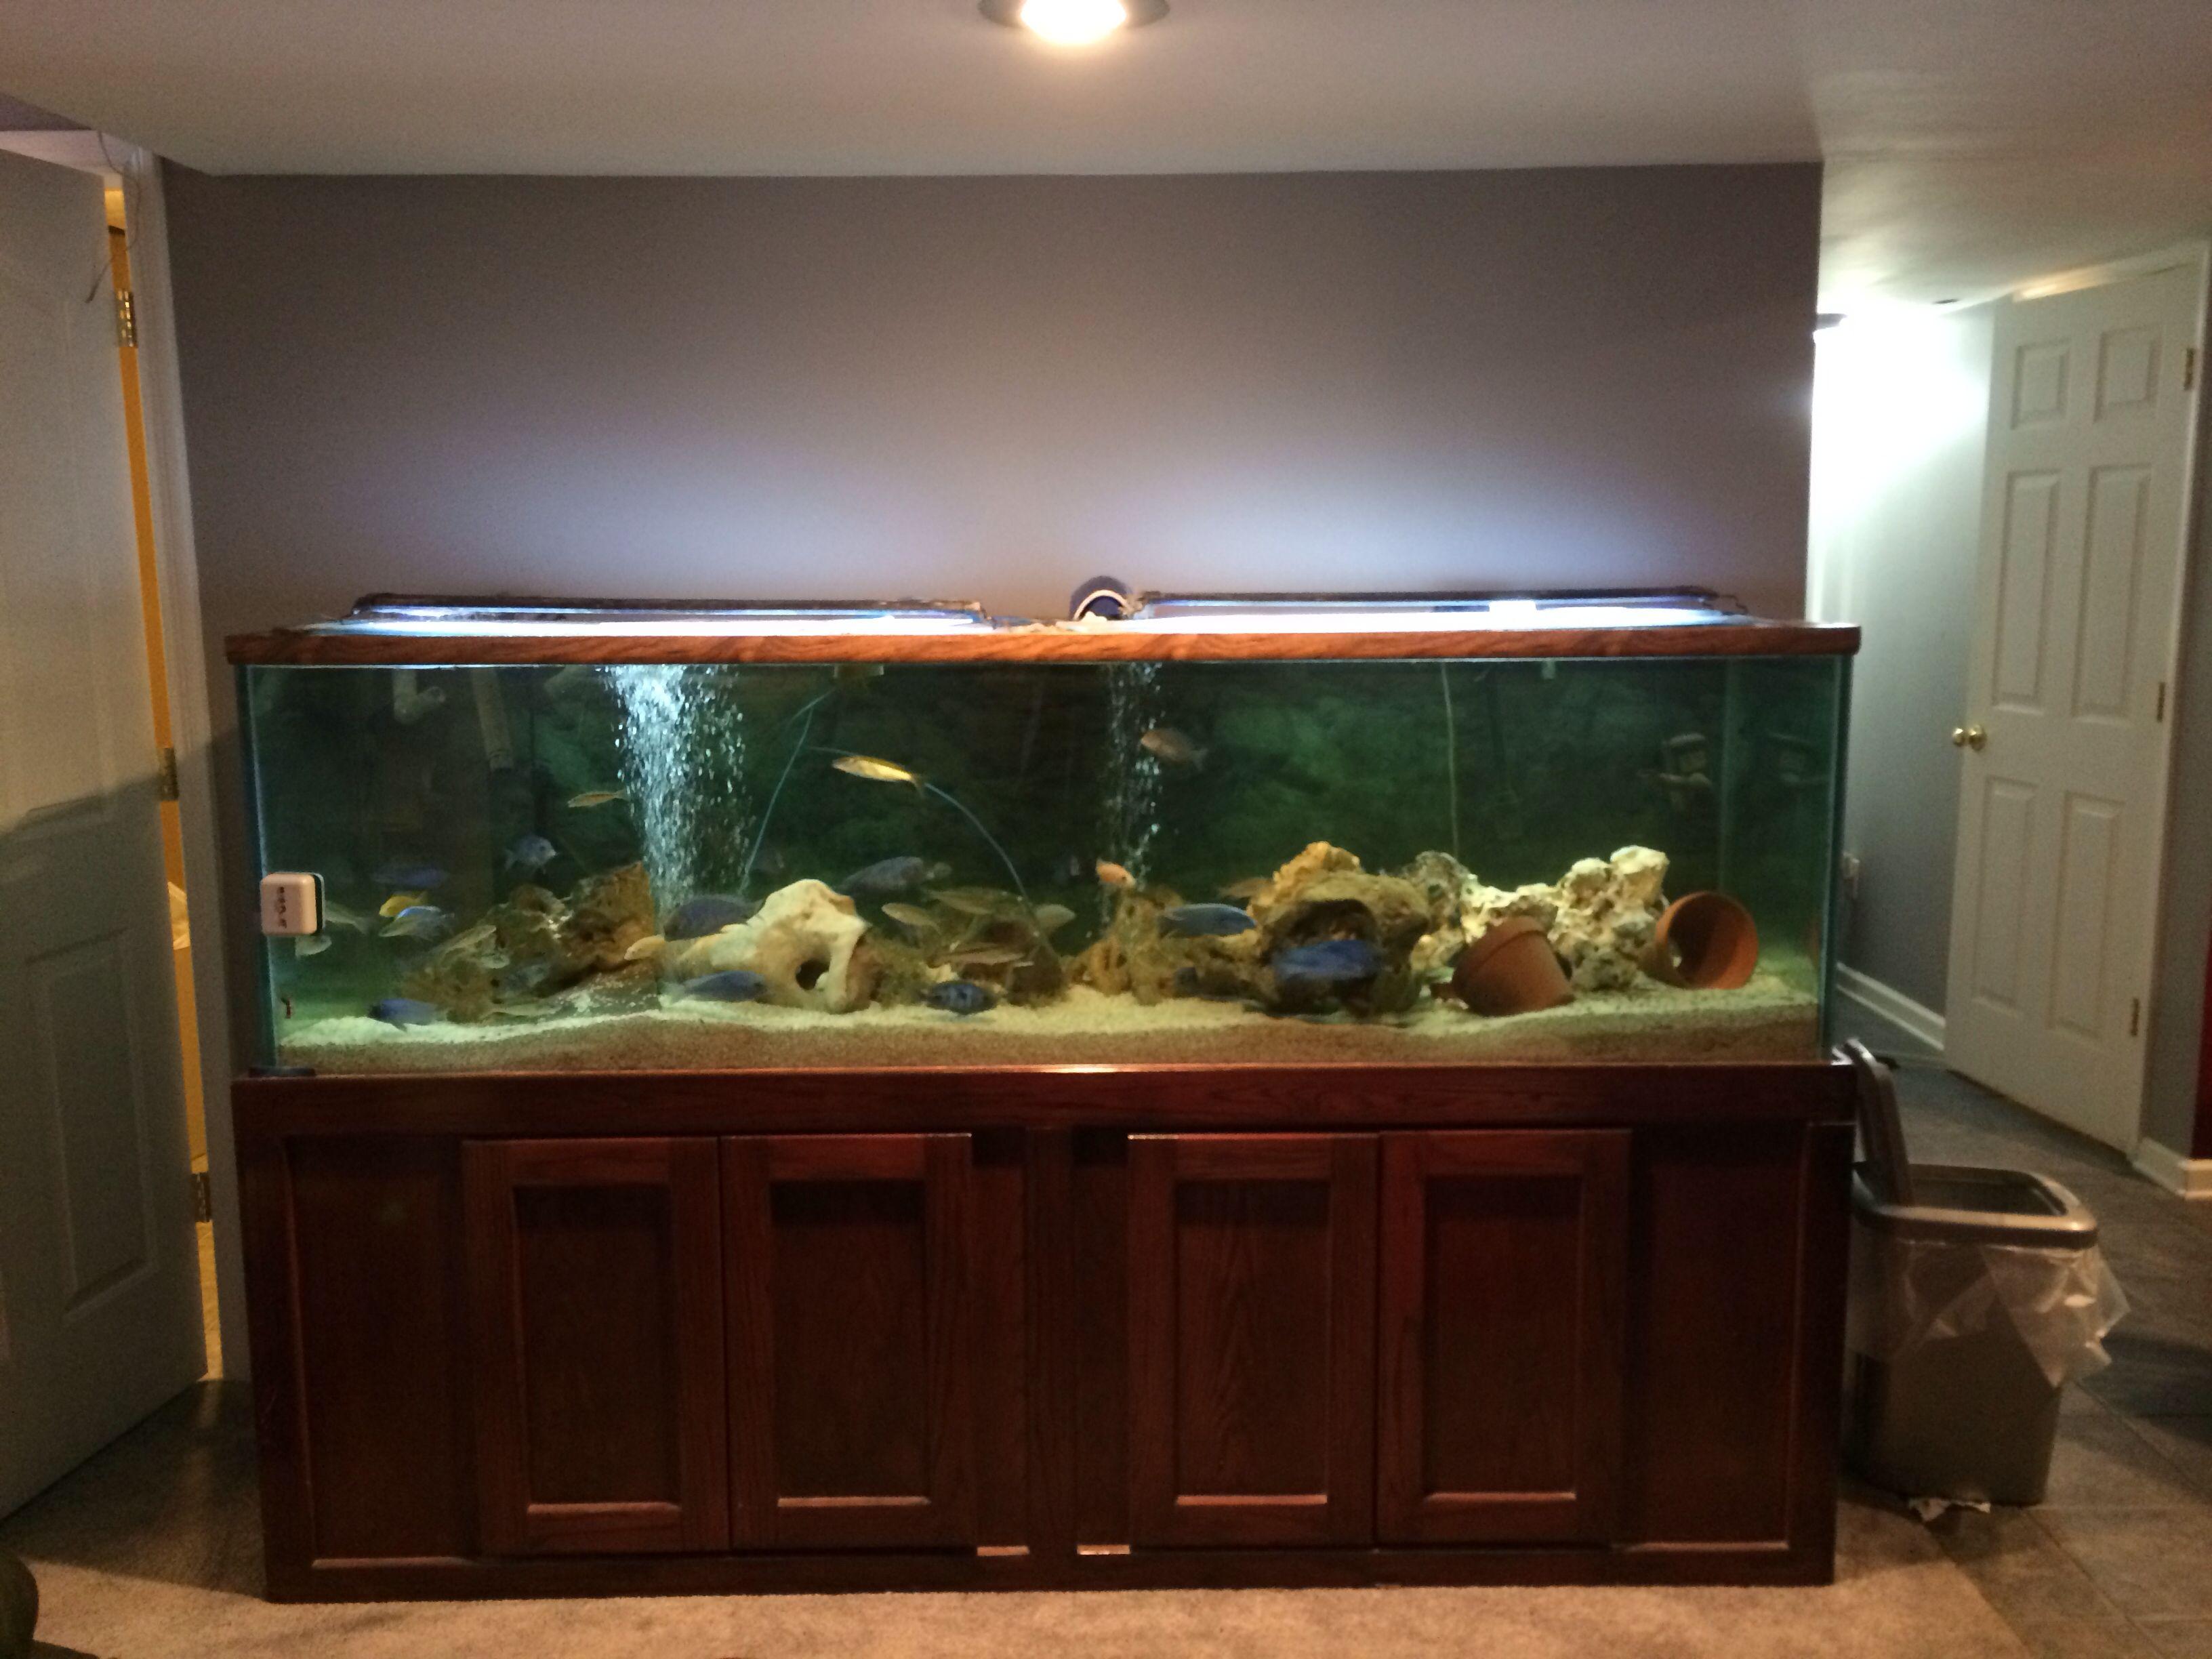 220 gallon African cichlid aquarium here in Louisville, ky ...